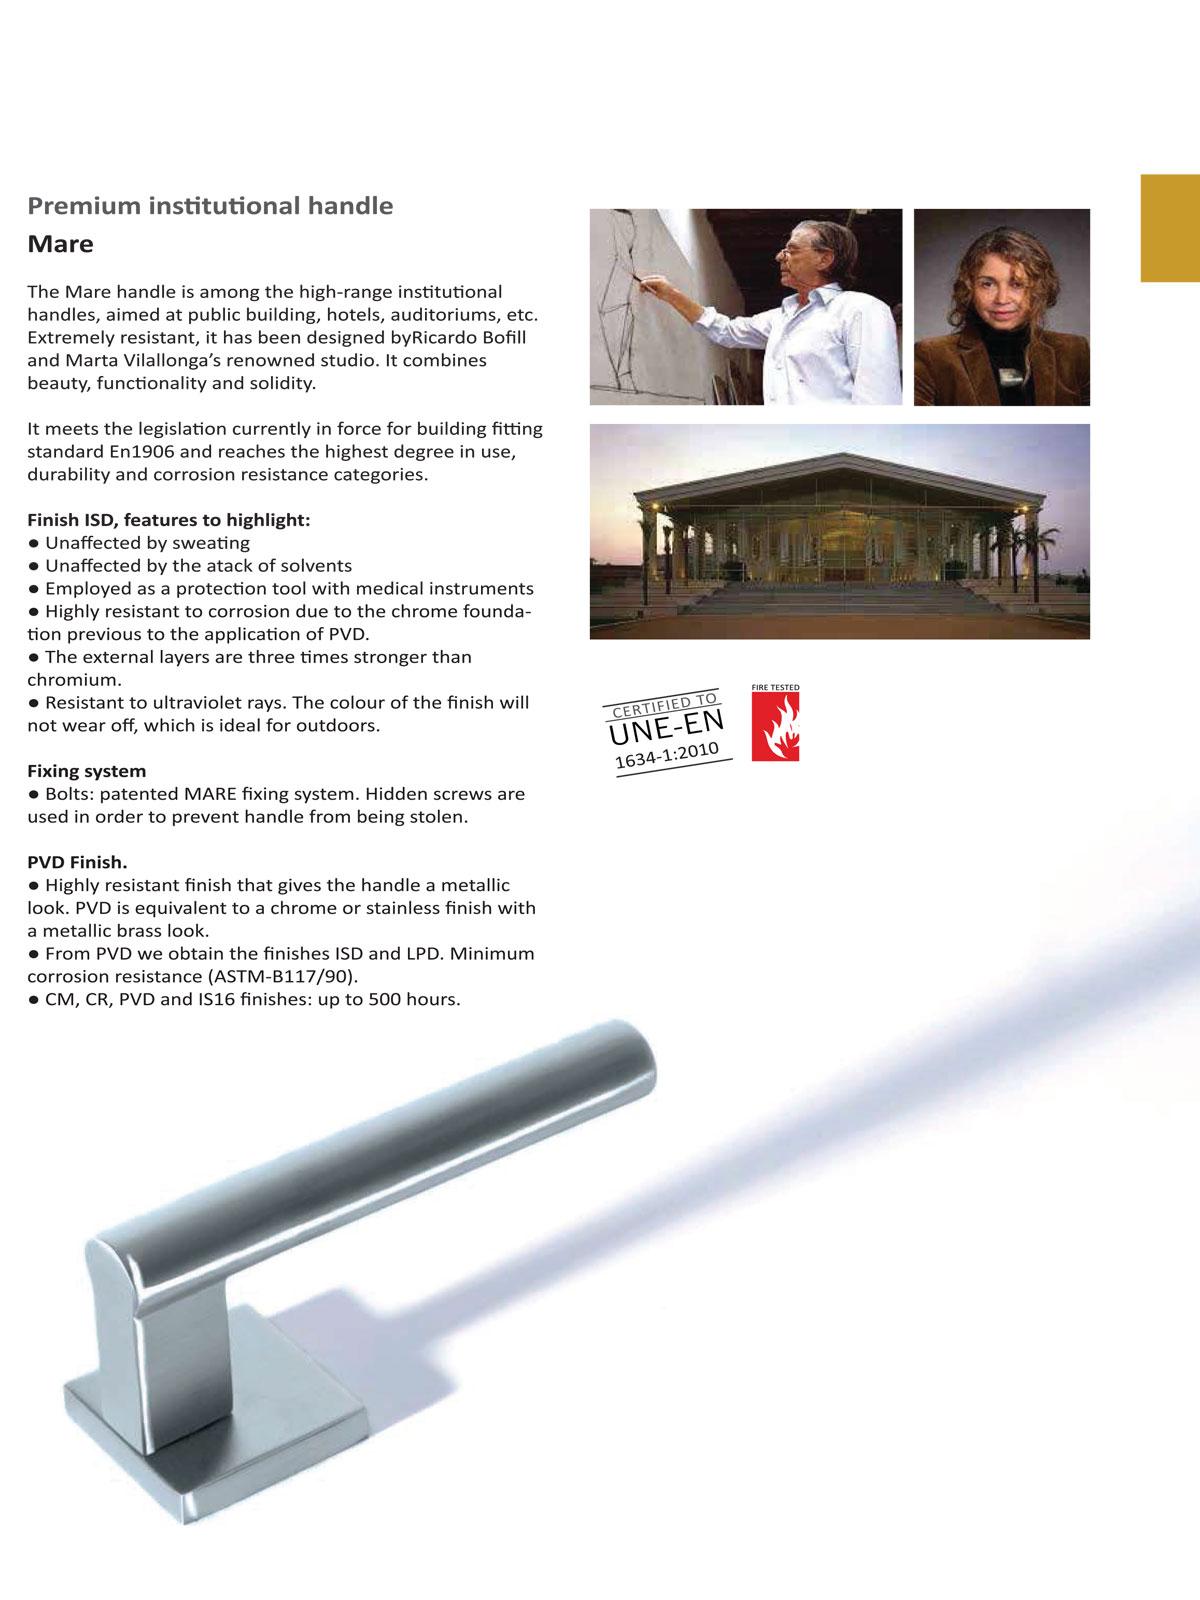 stainless steel lever handle, stainless steel door handle, stainless steel door pull, 304 lever handle, 316 lever handle, weather proof door lever handle, stainless steel push & Pull handle, Fortress Land Security Company, Yangon, Myanmar